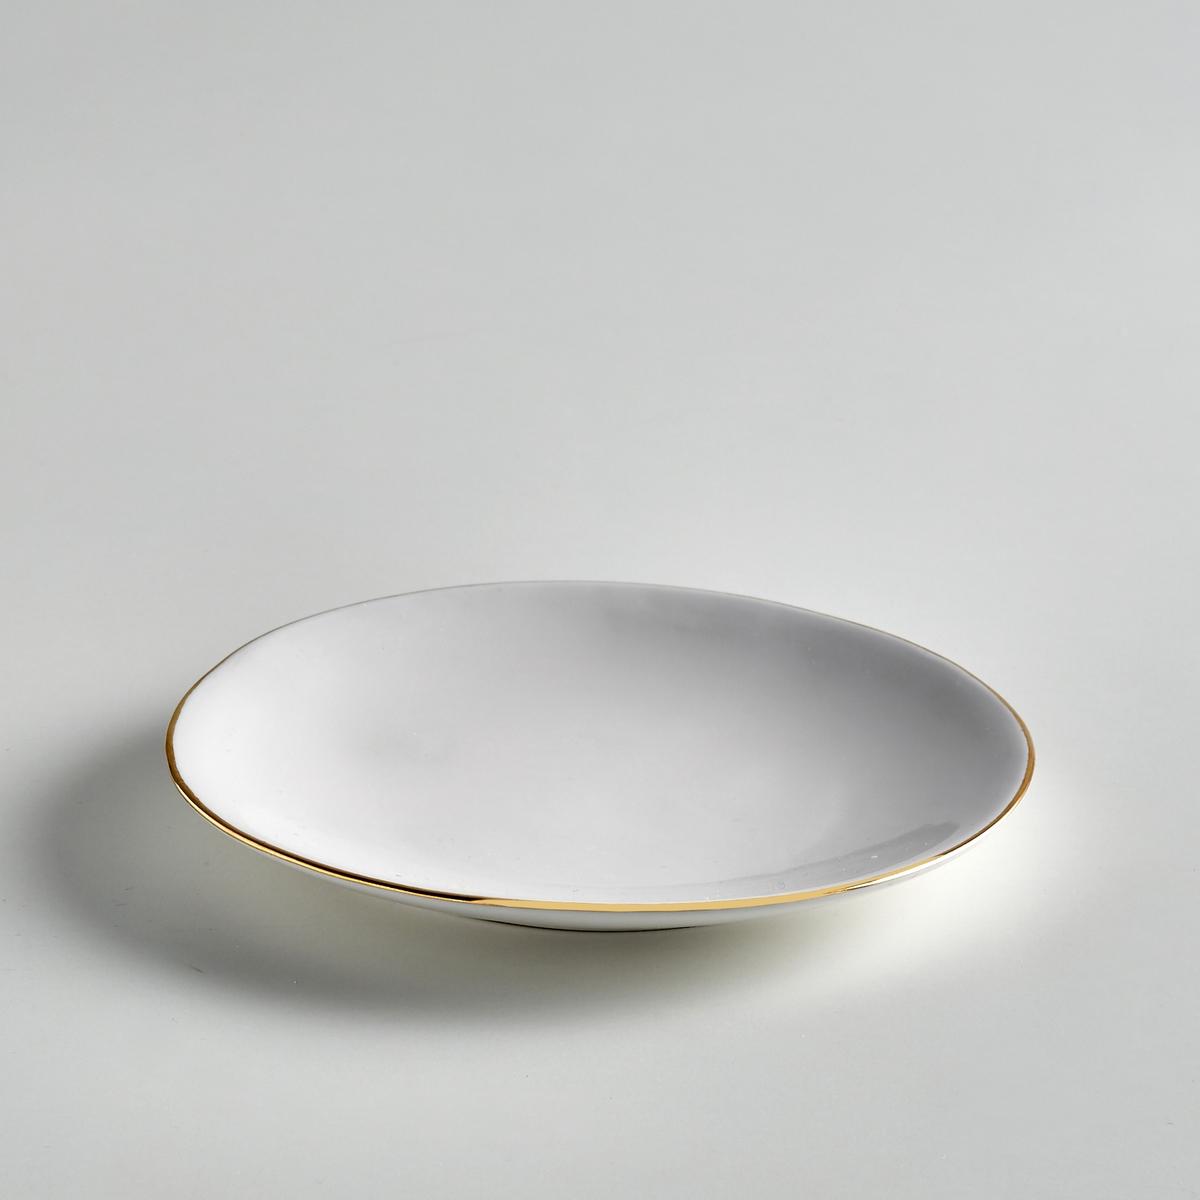 Комплект из 4 десертных тарелок  фаянса Catalpa